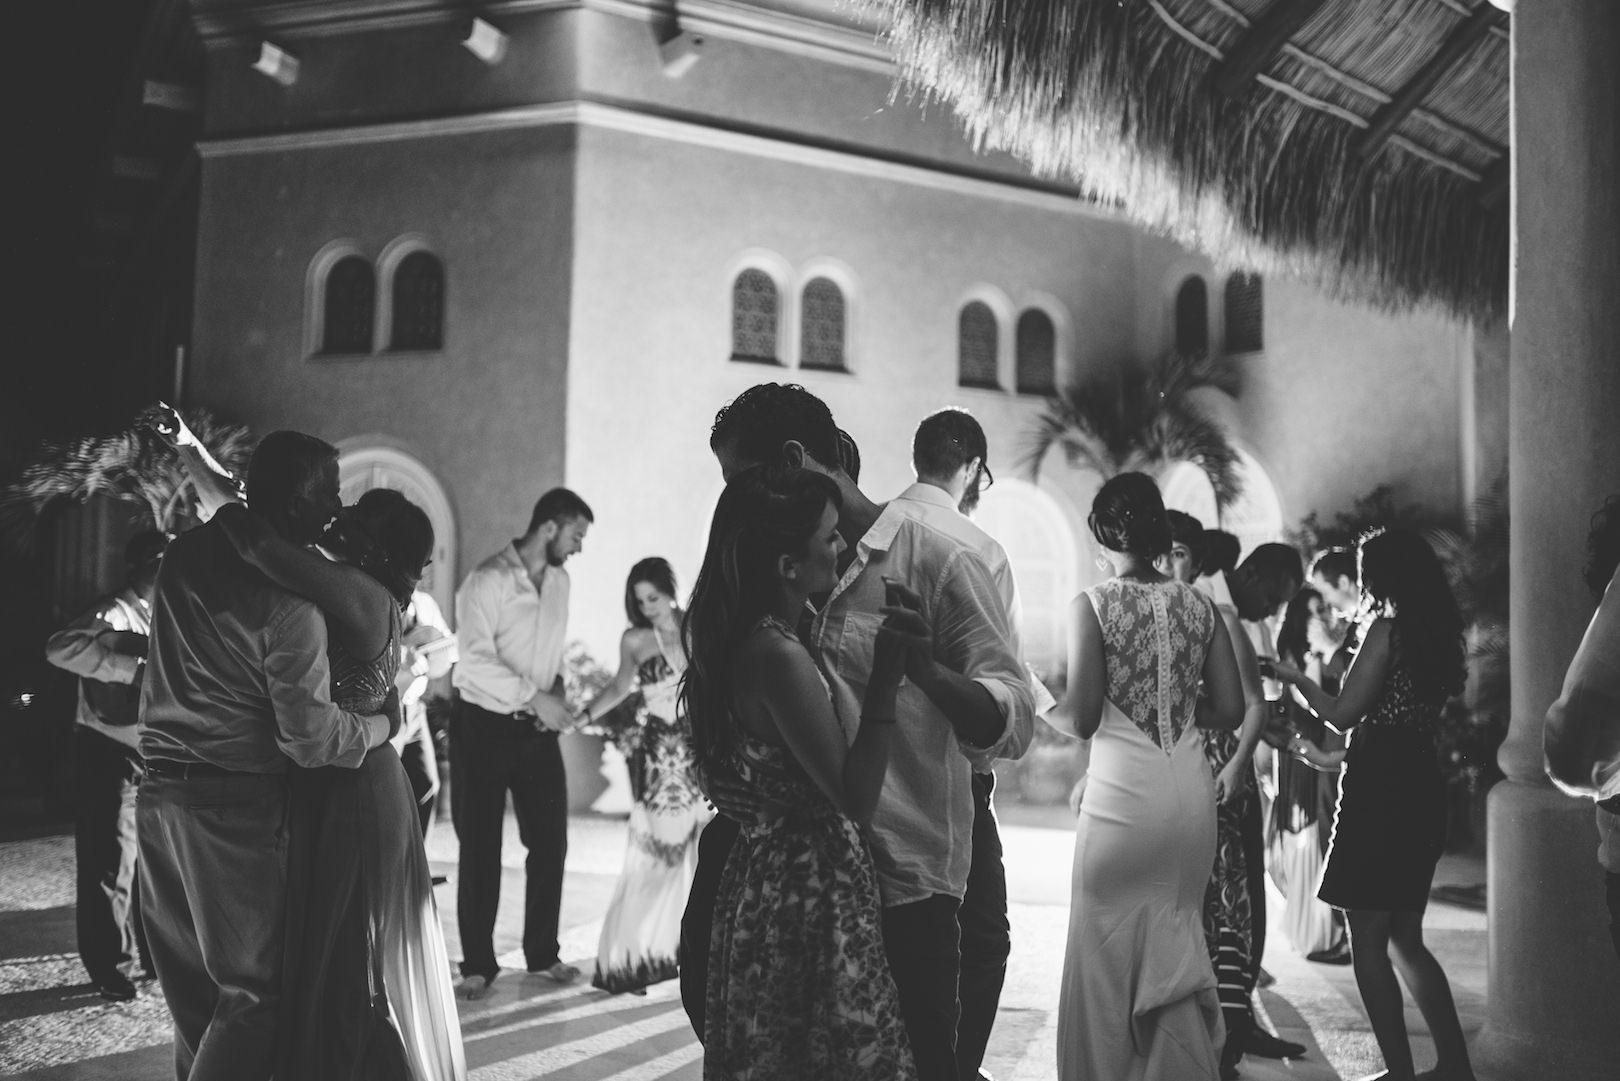 Nathan & Felicia - Wedding Day - © Dallas Kolotylo Photography - 697